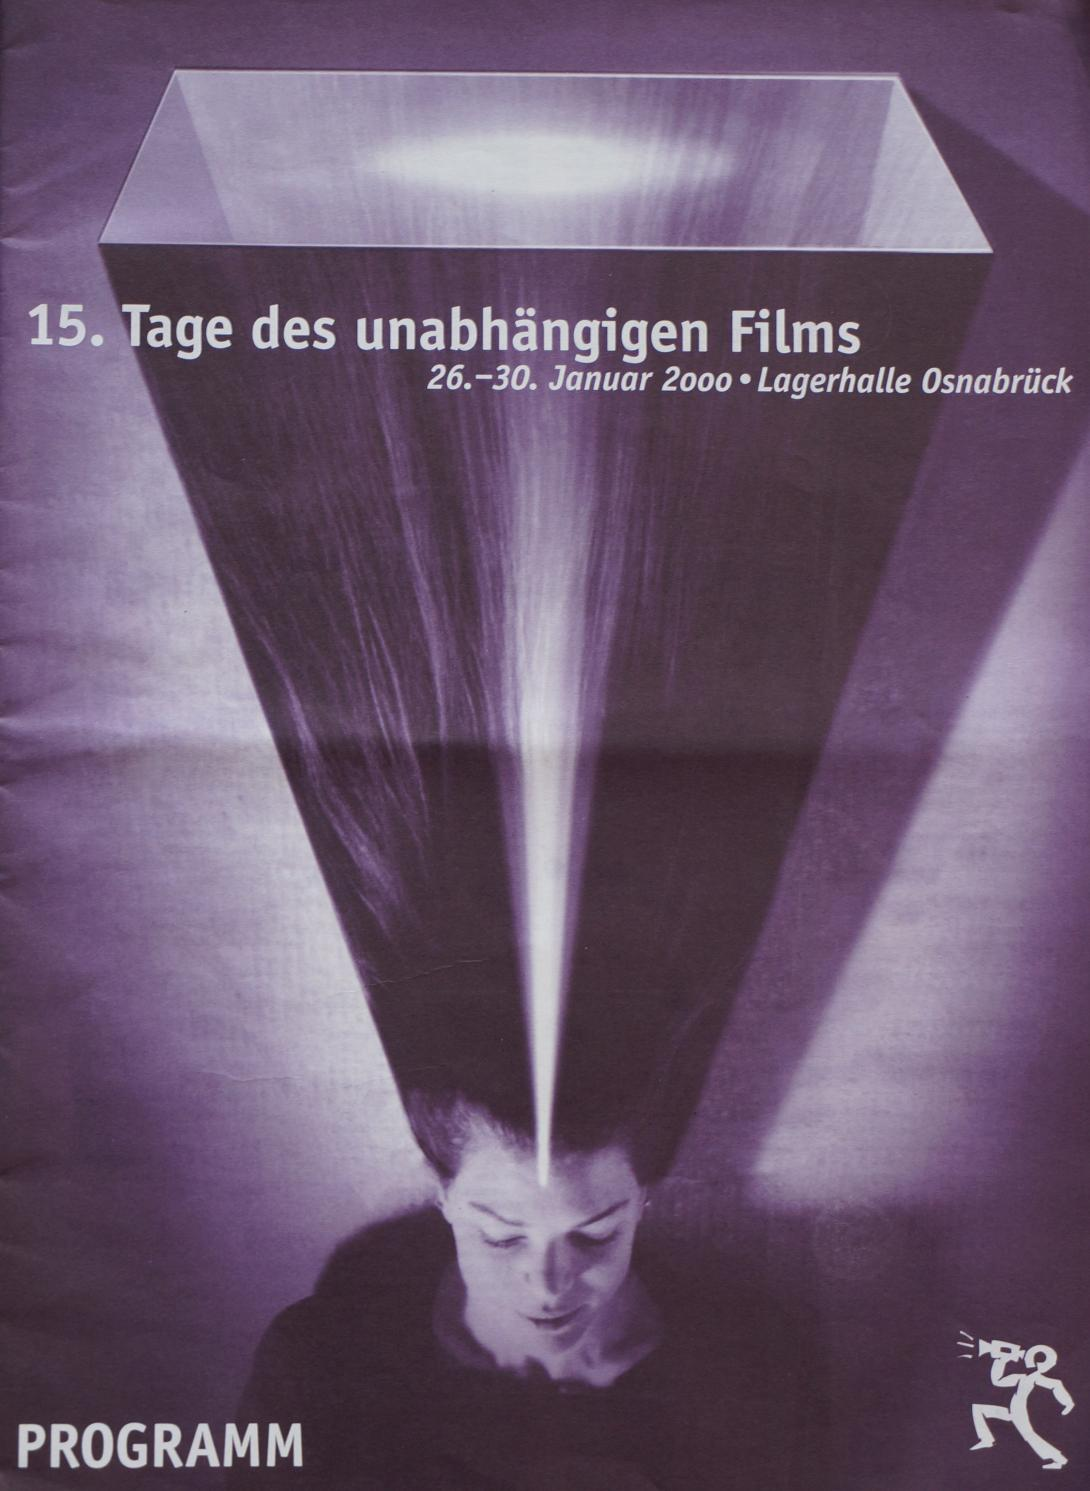 15 Tage Des Unabhängigen Films Programm 2000 By